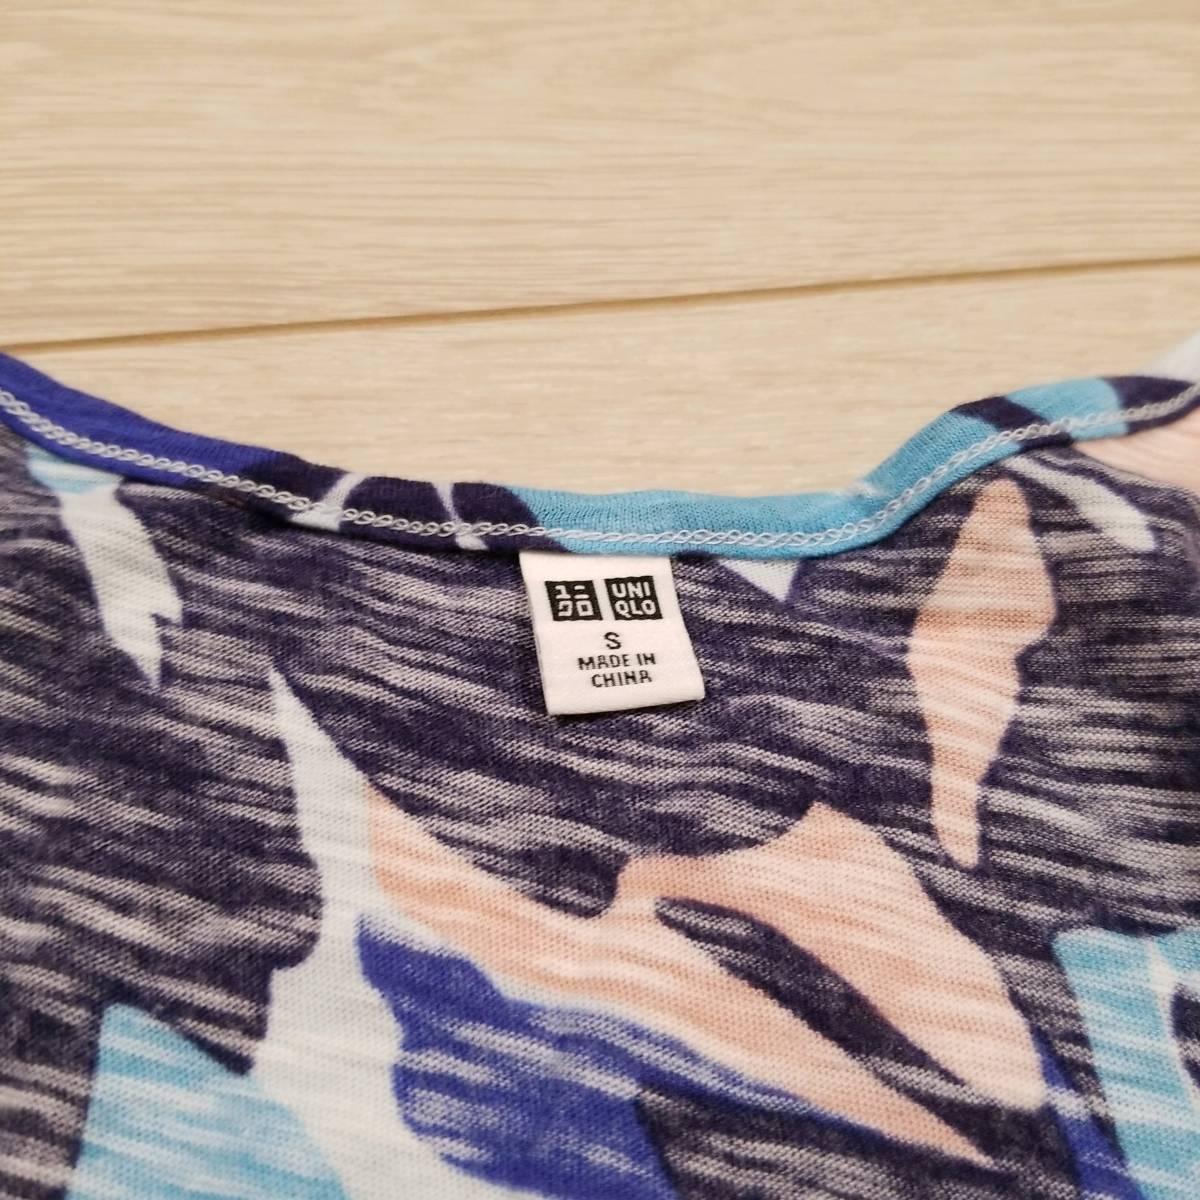 K647 最終値下げ UNIQLO ユニクロ S レディース タンクトップ ノースリーブ シャツ 花柄 青系 綿100% コットン..